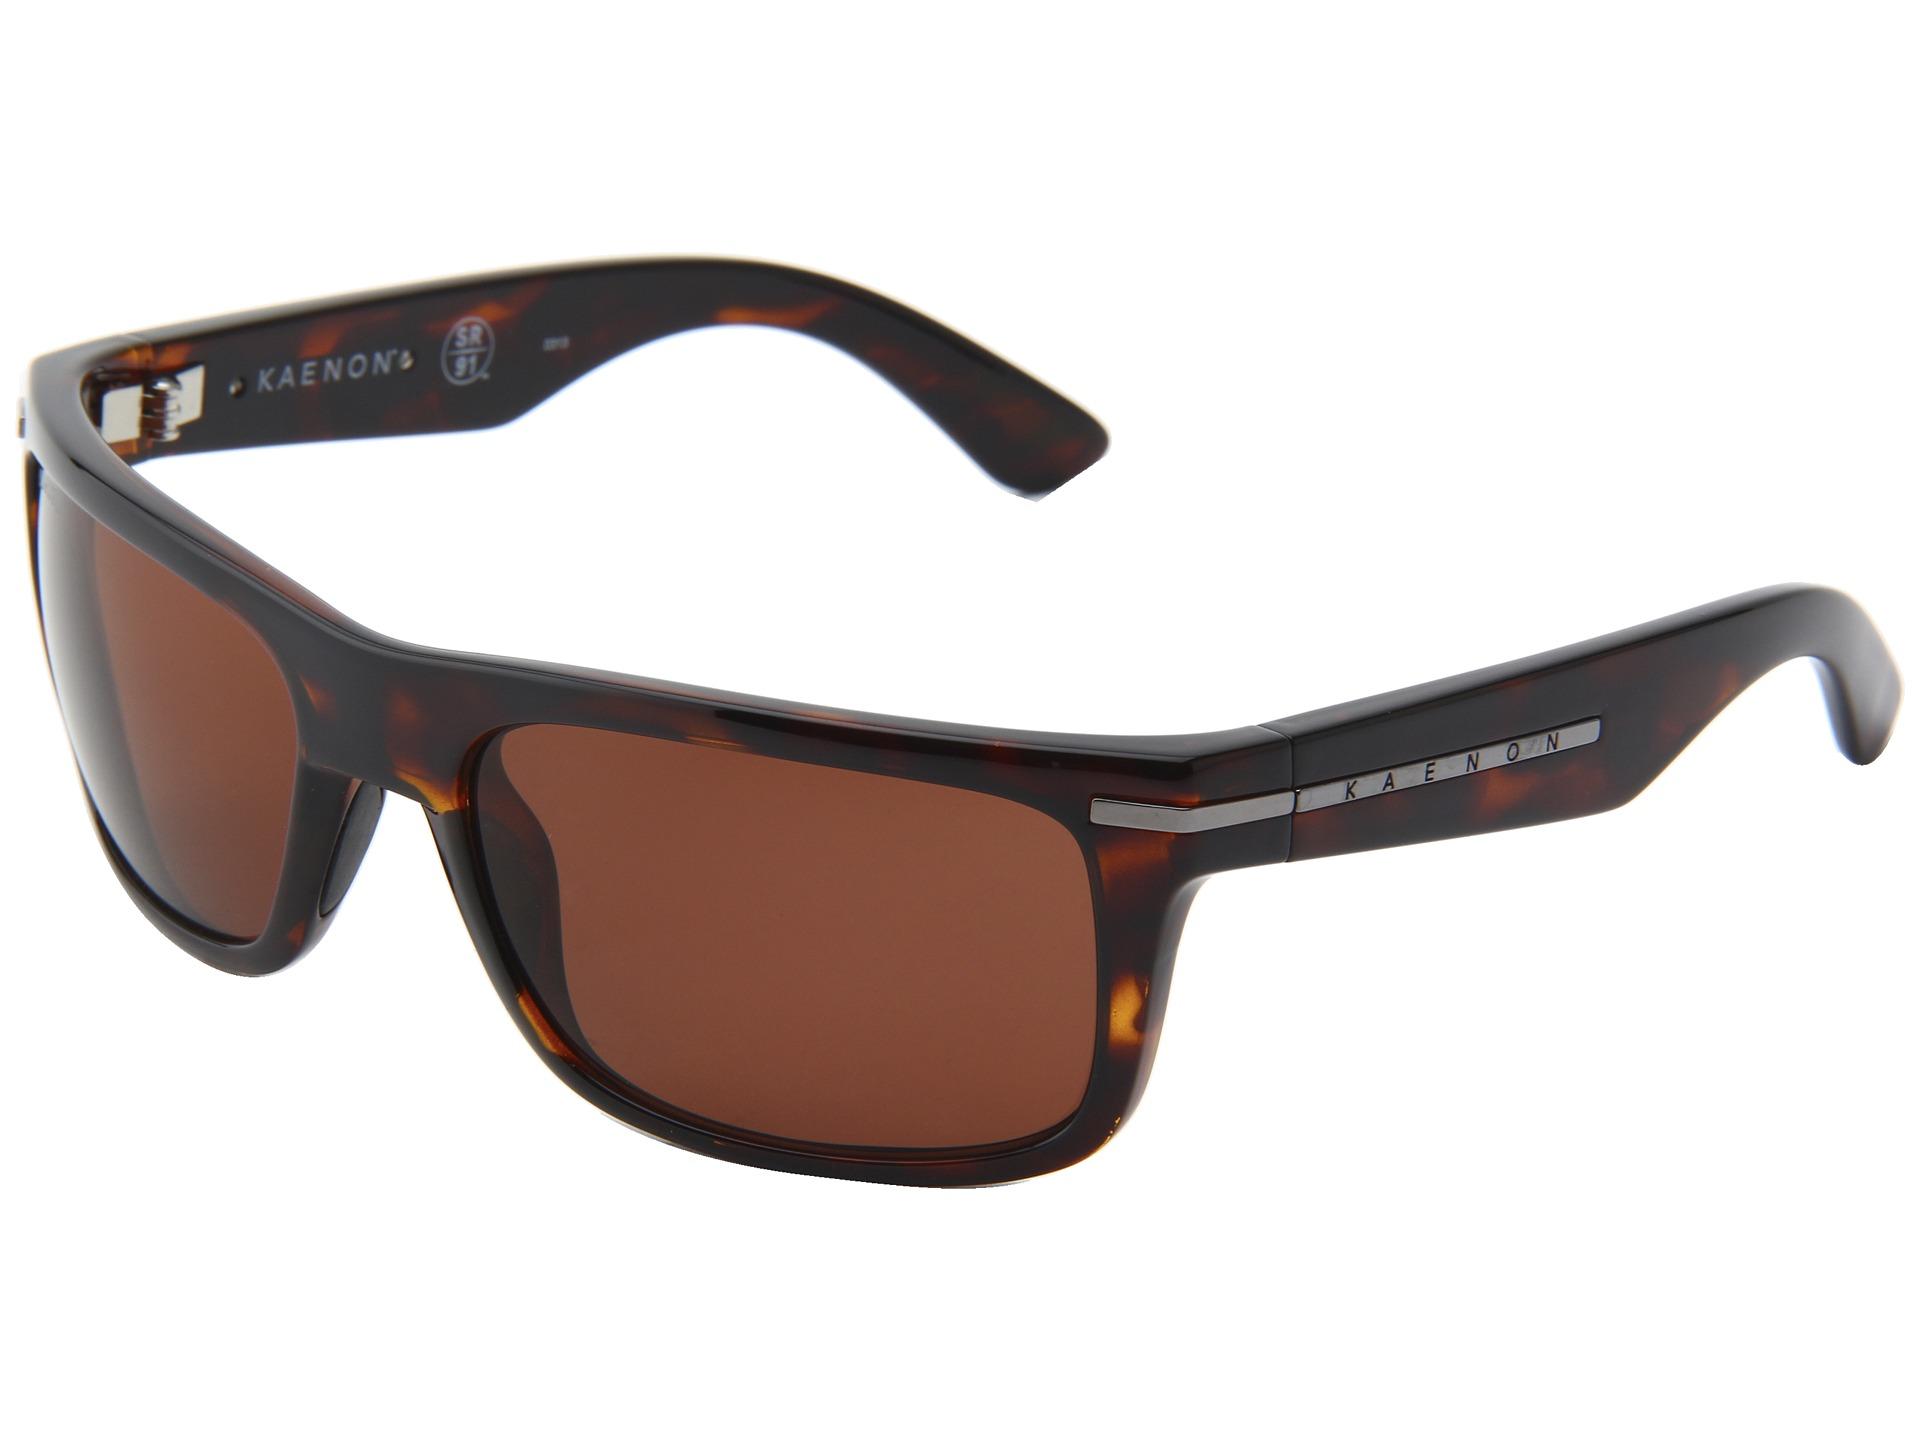 7c294d4f482 Kaenon Rhino Polarized Sunglasses Review « Heritage Malta